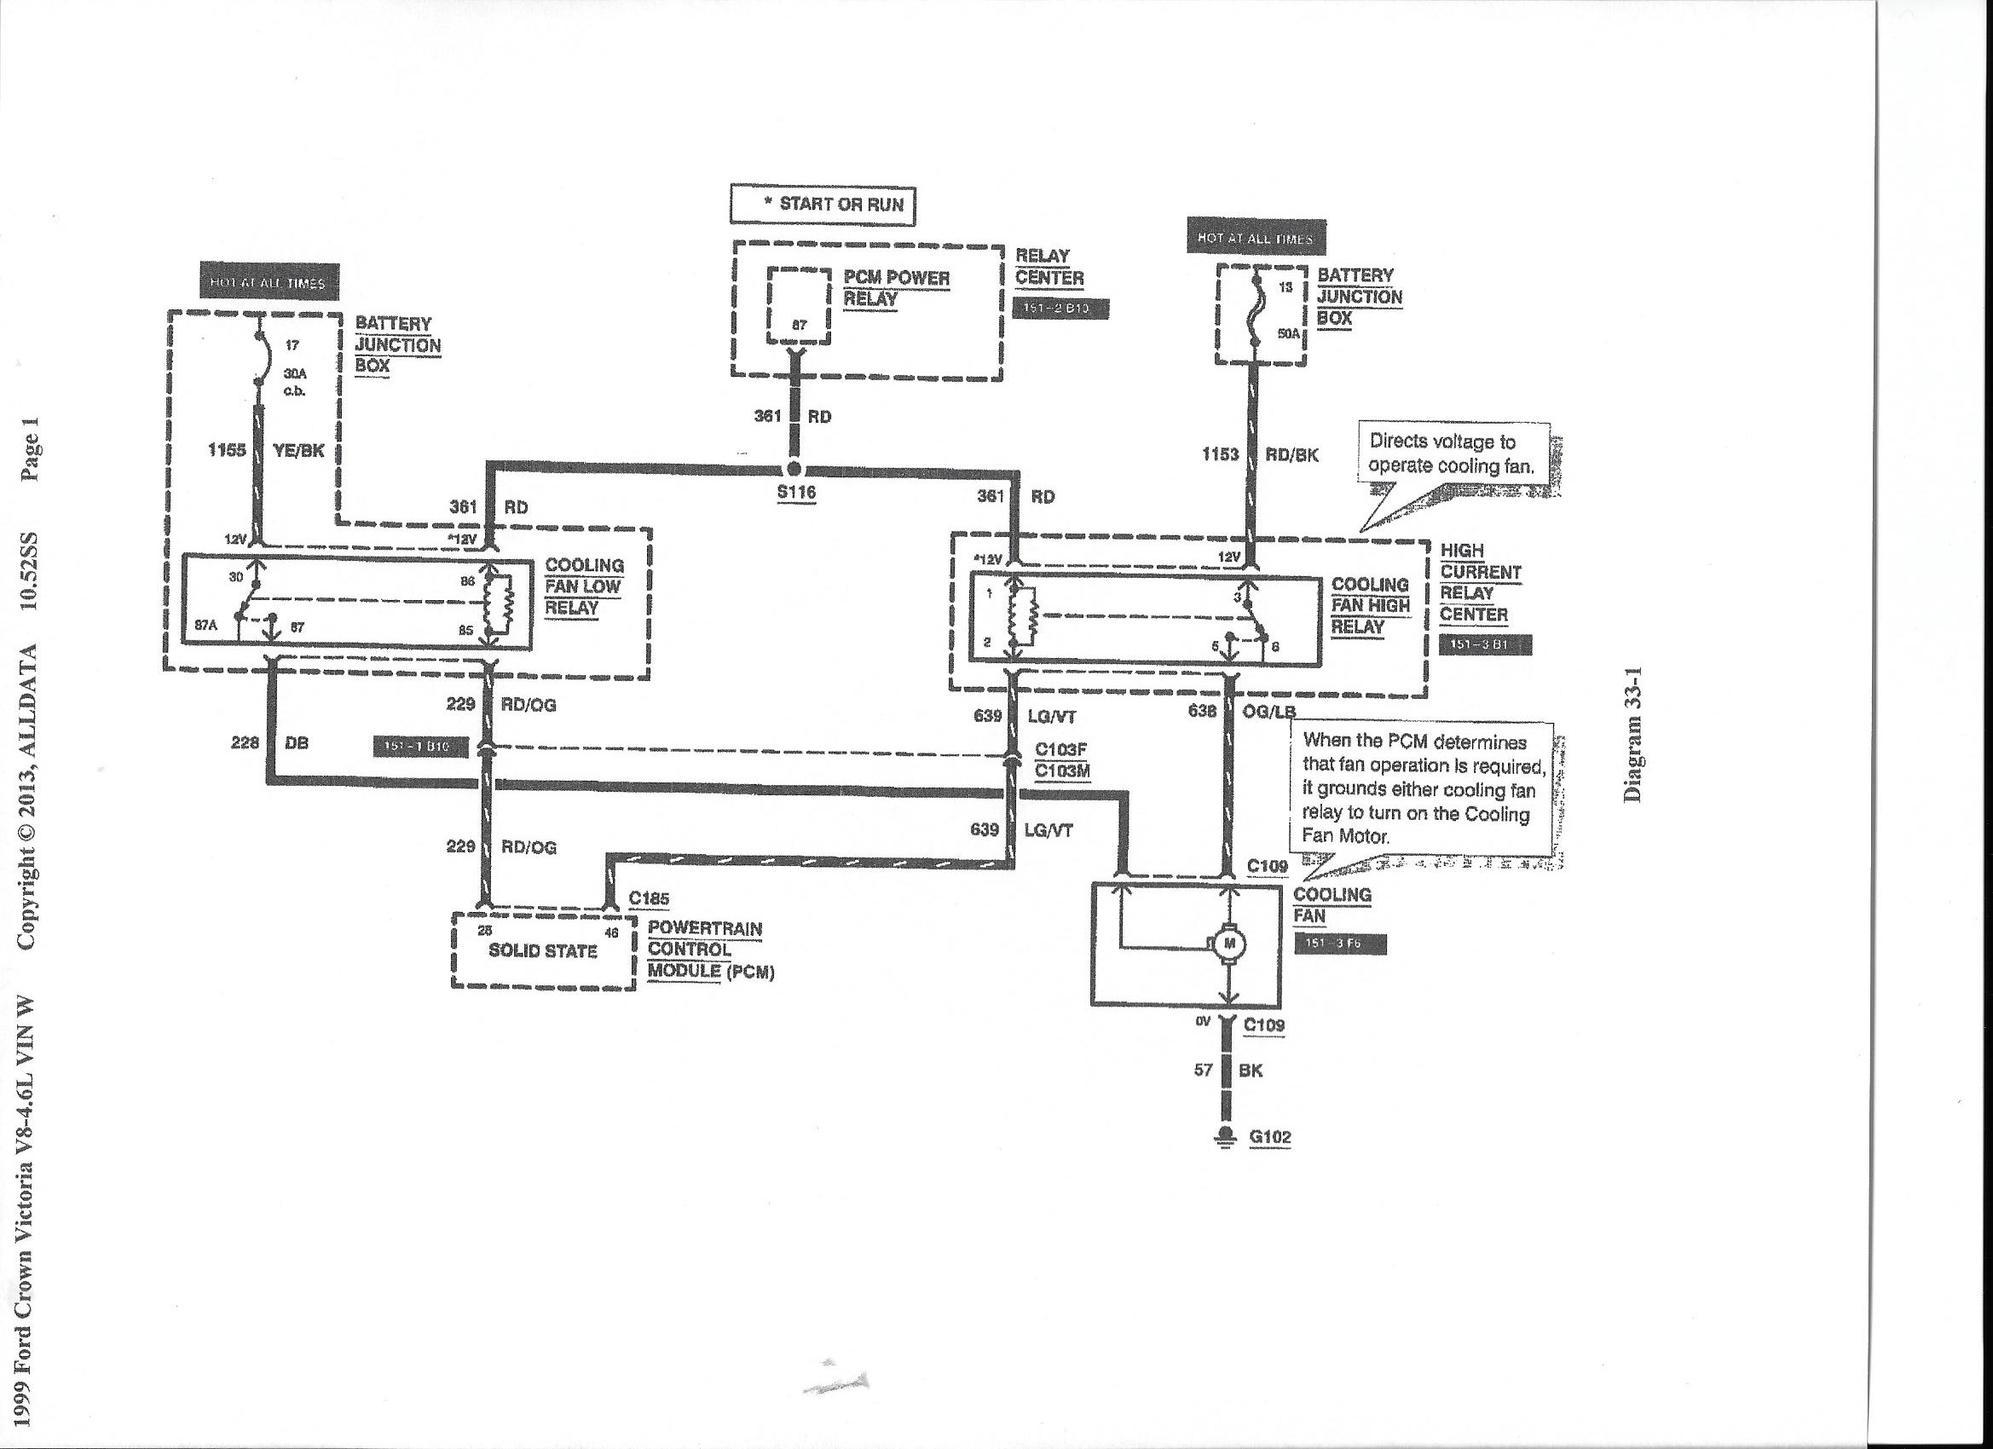 1999 Peterbilt 379 Fan Wiring Diagram Schematics Also 1996 On Electrical Panel Headlight 34 Images